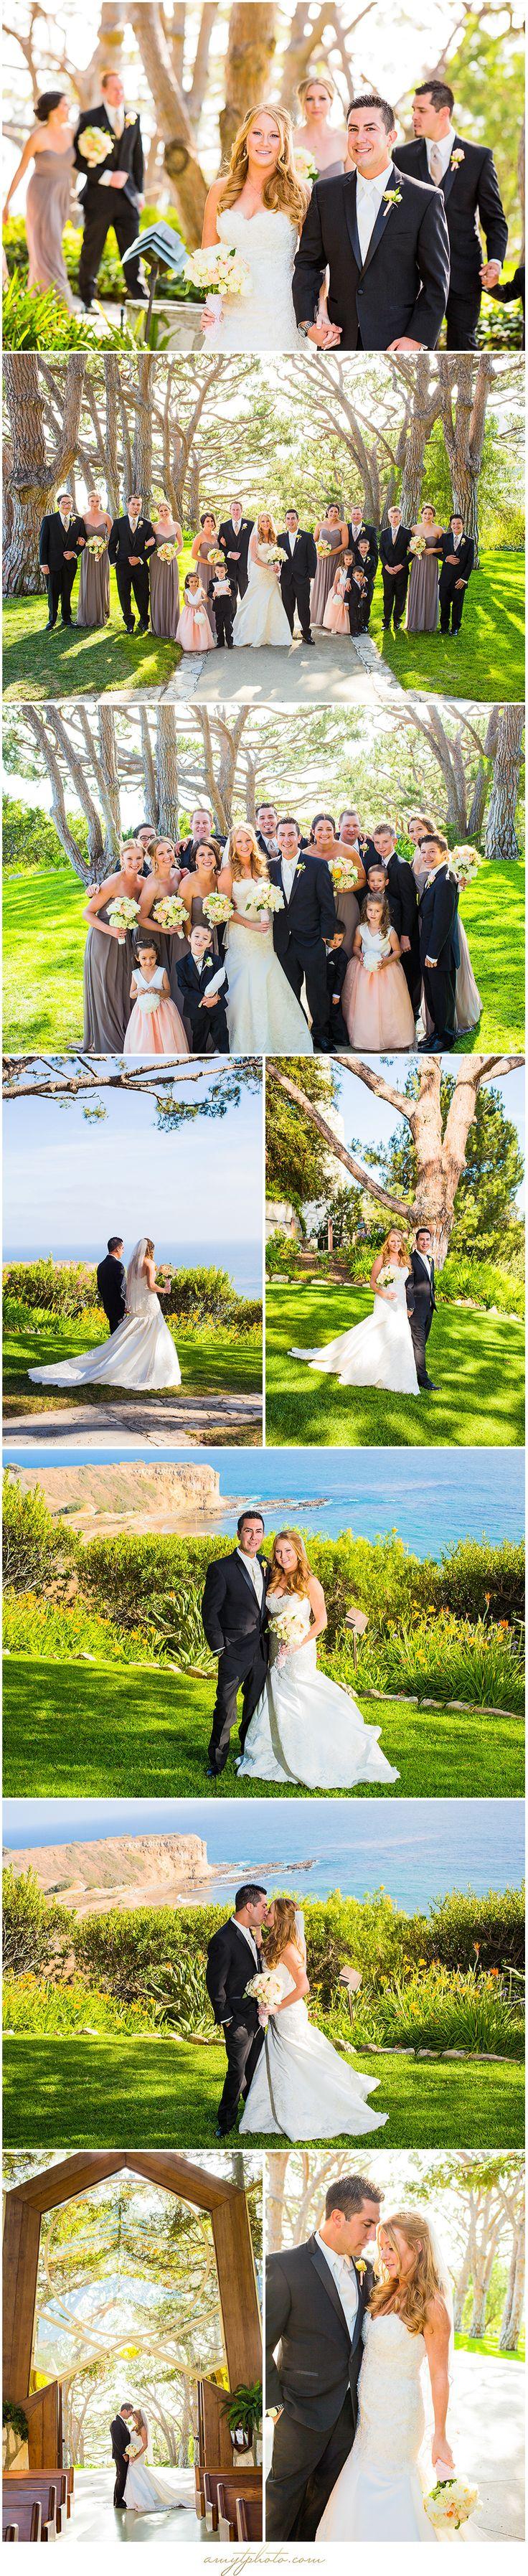 Amy Theilig Photographic | Wayfarers Chapel + La Venta Inn Wedding | Breanne…